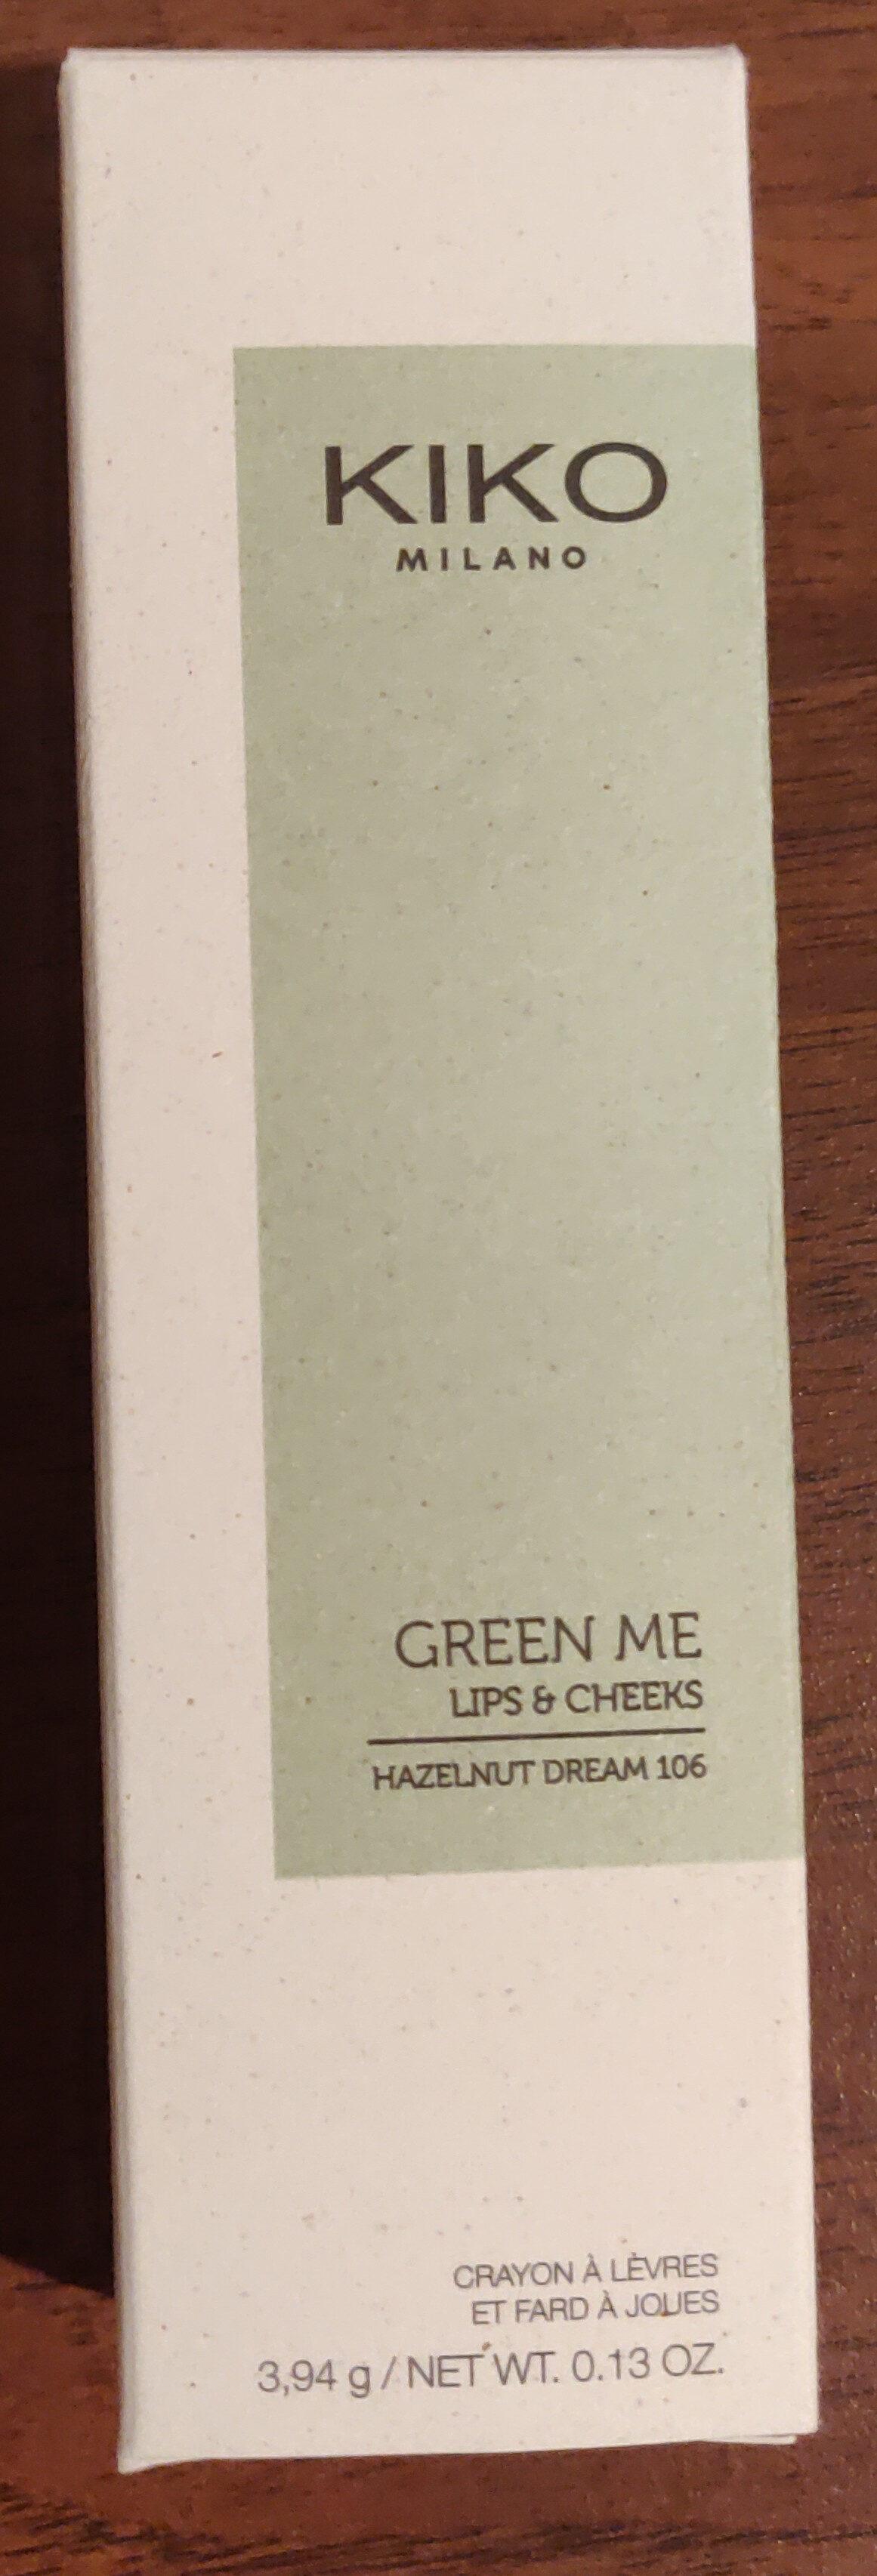 green me lips & cheeks 106 - Product - it